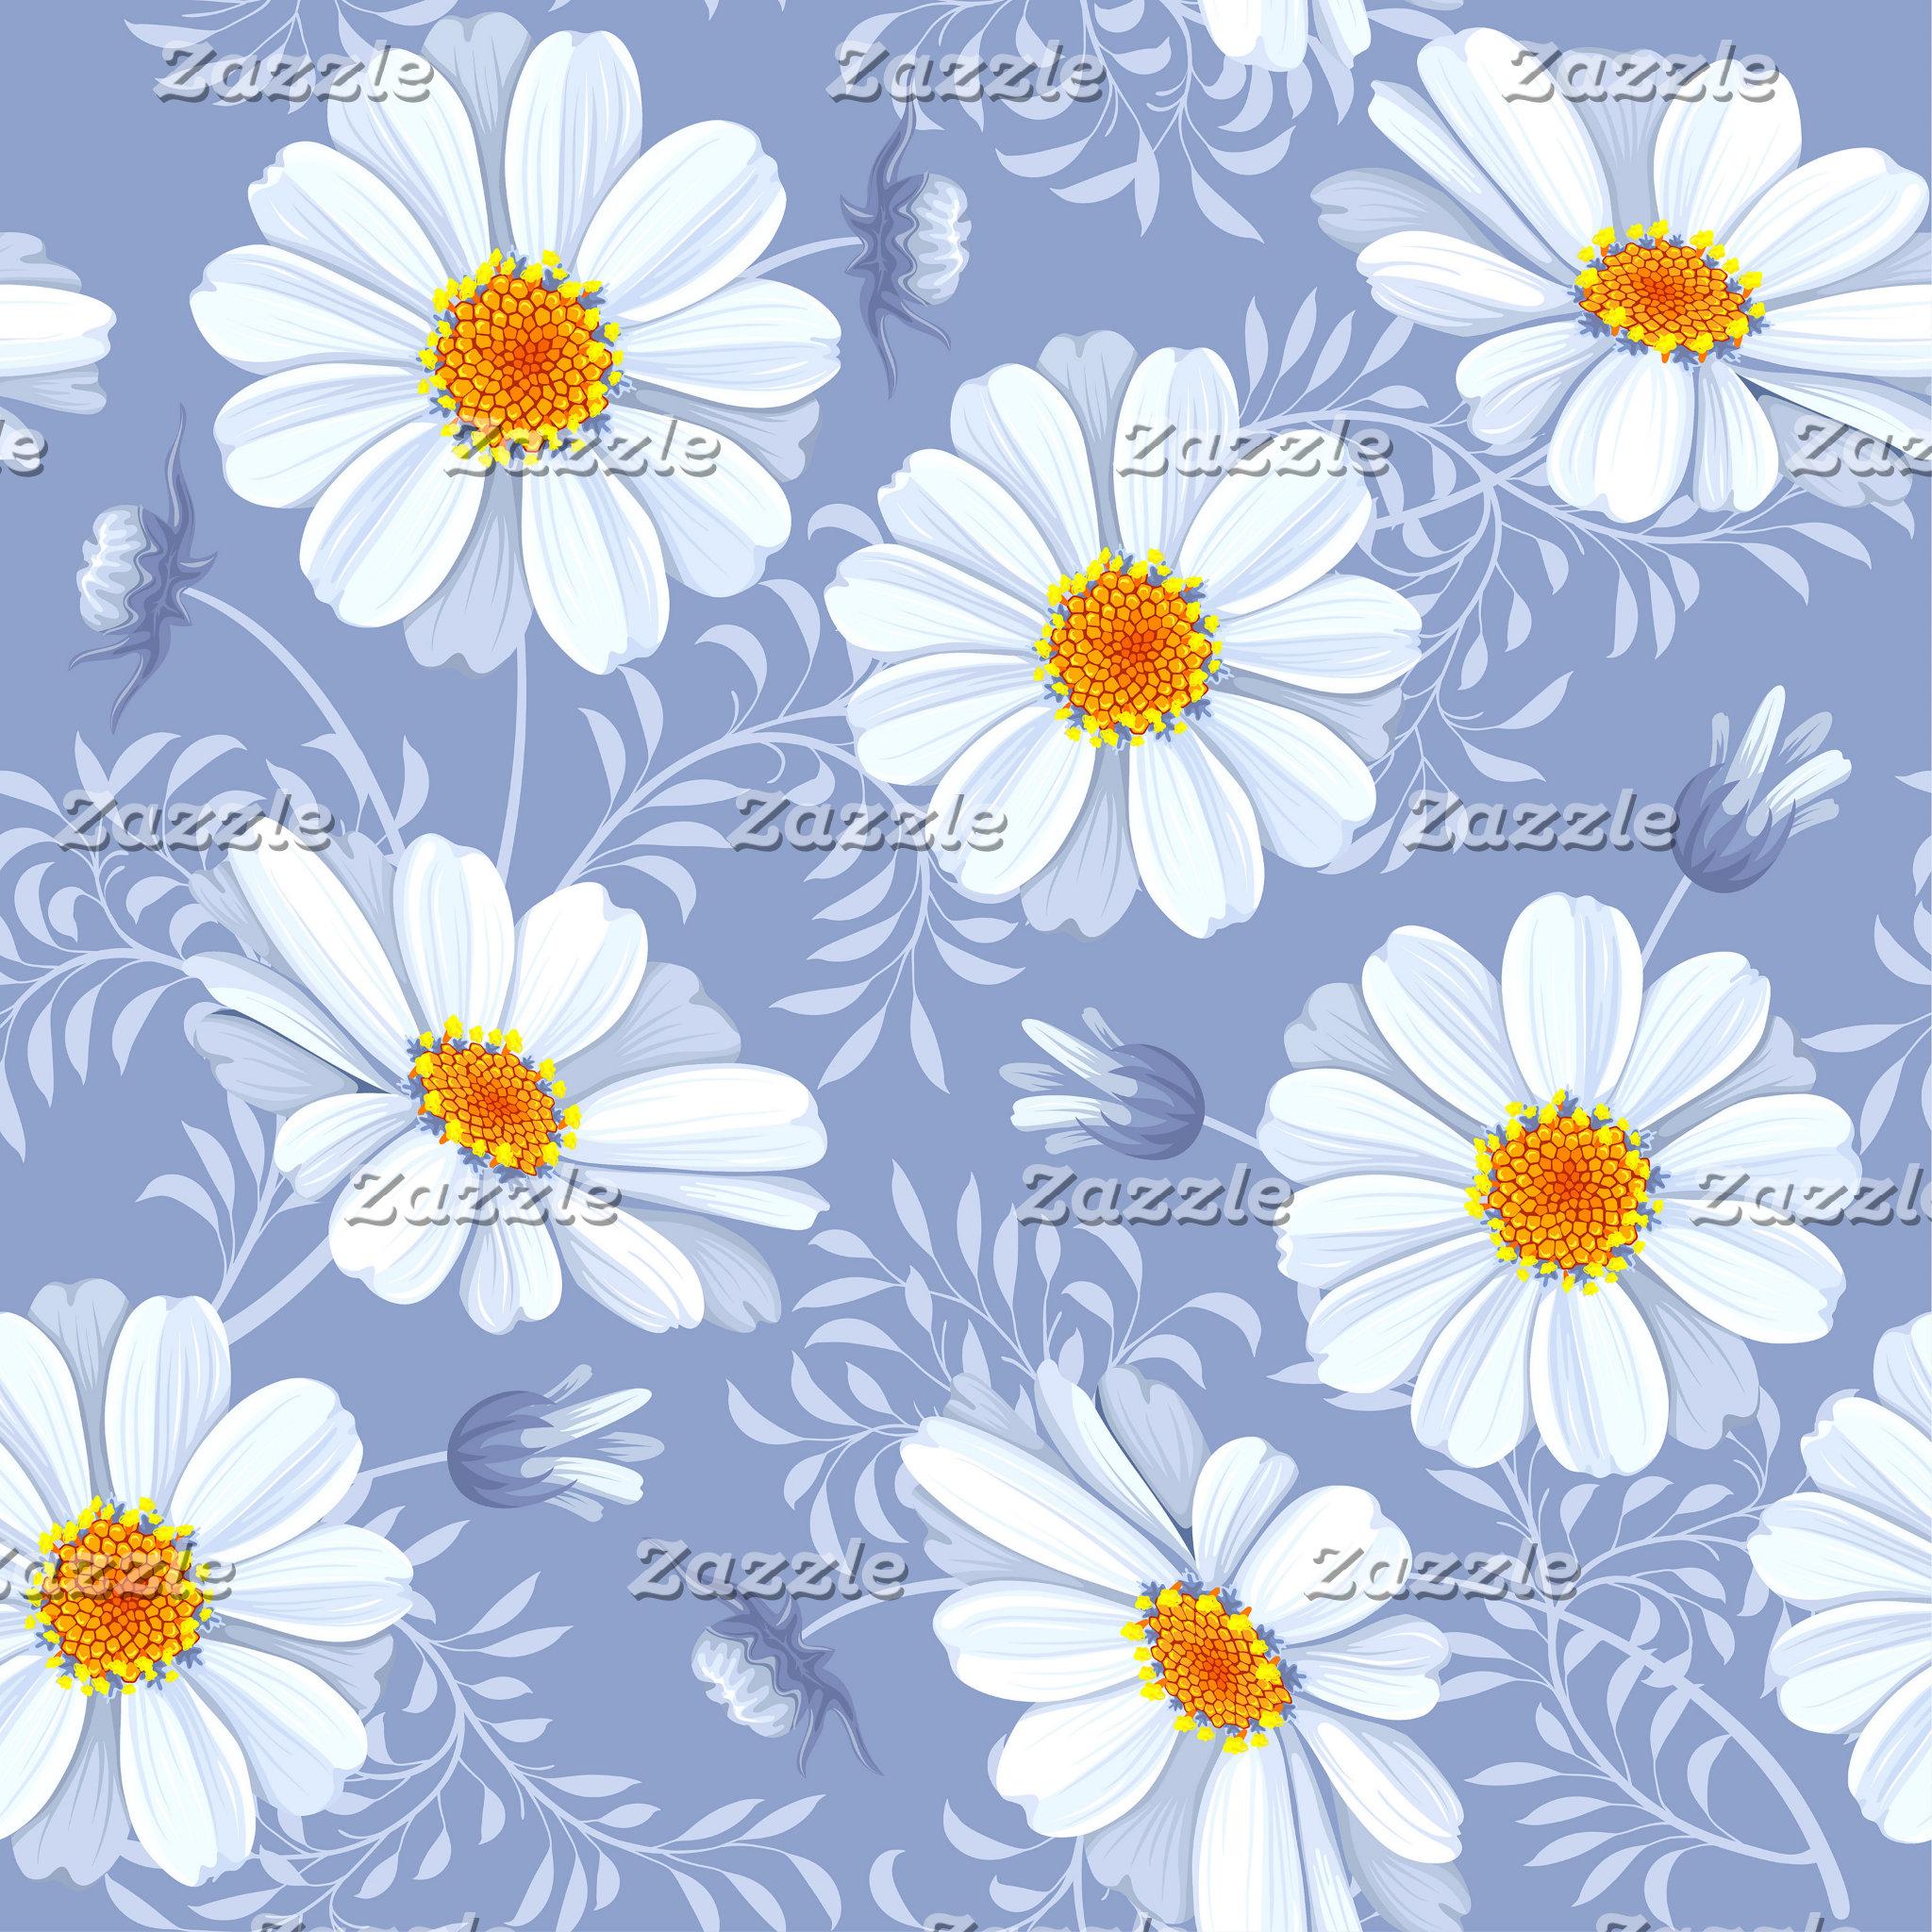 Spring Summer White Flower Bathroom and Home Decor